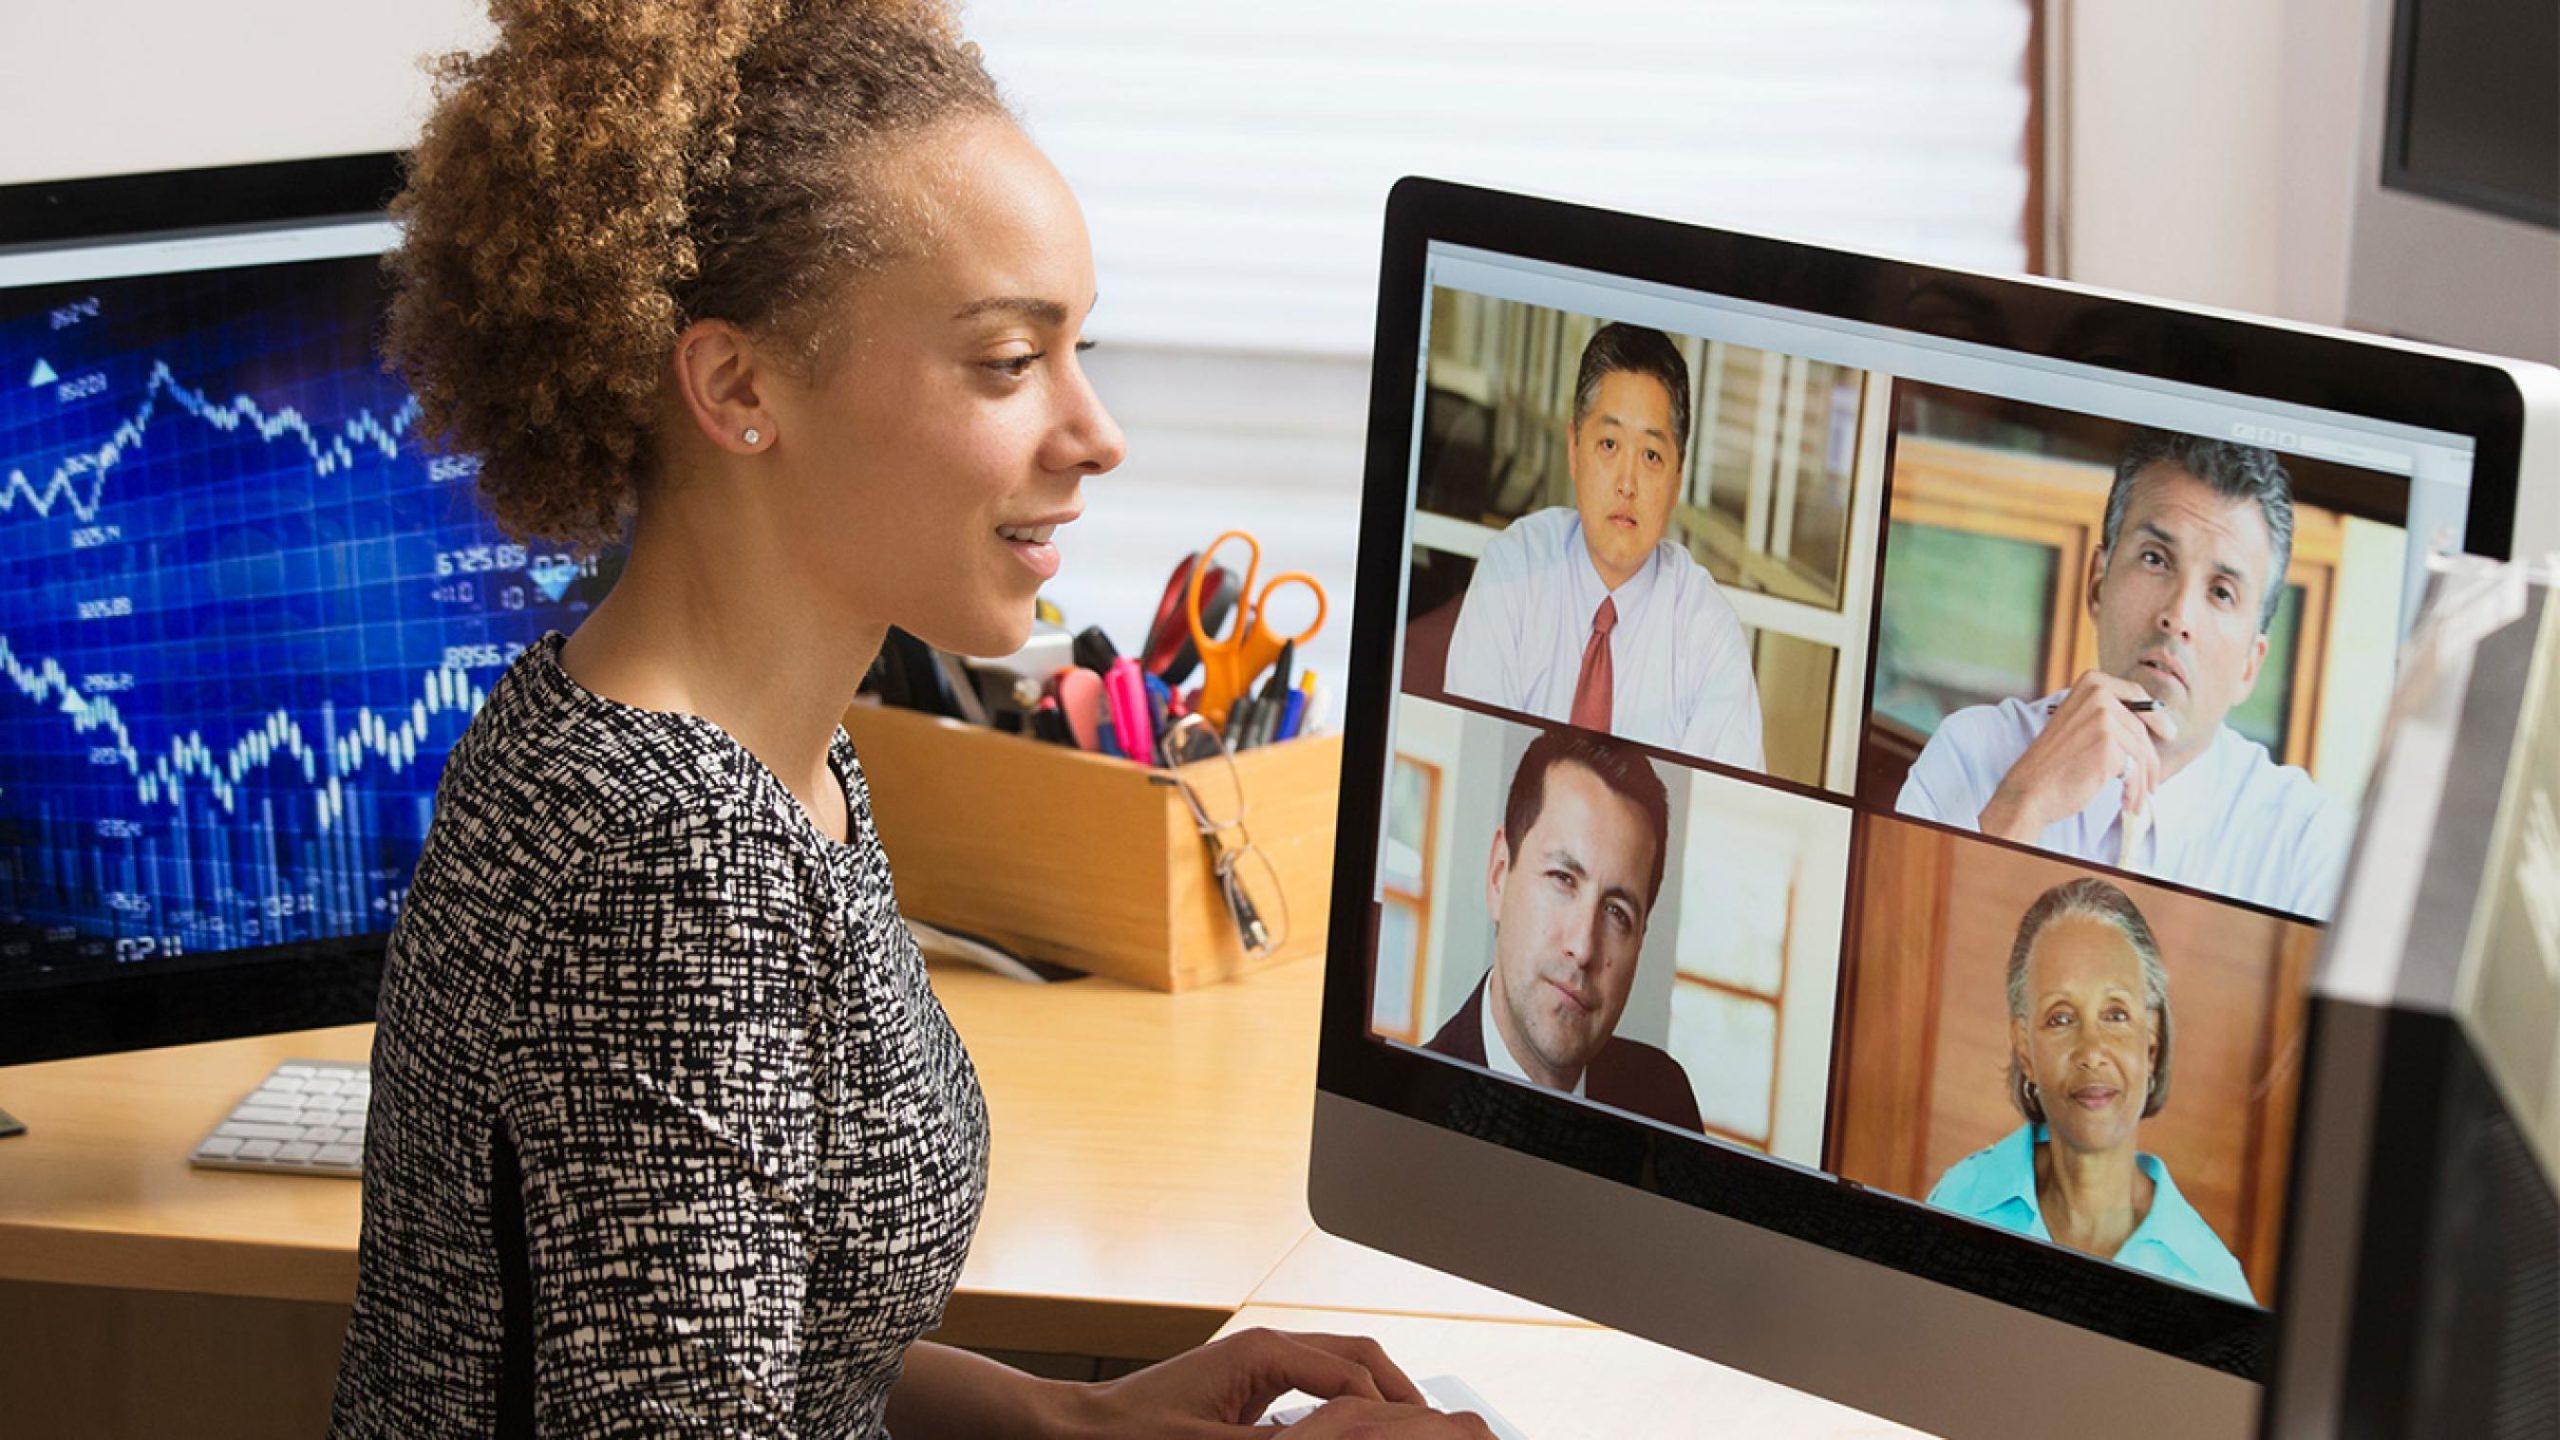 Face toward a window during a video call